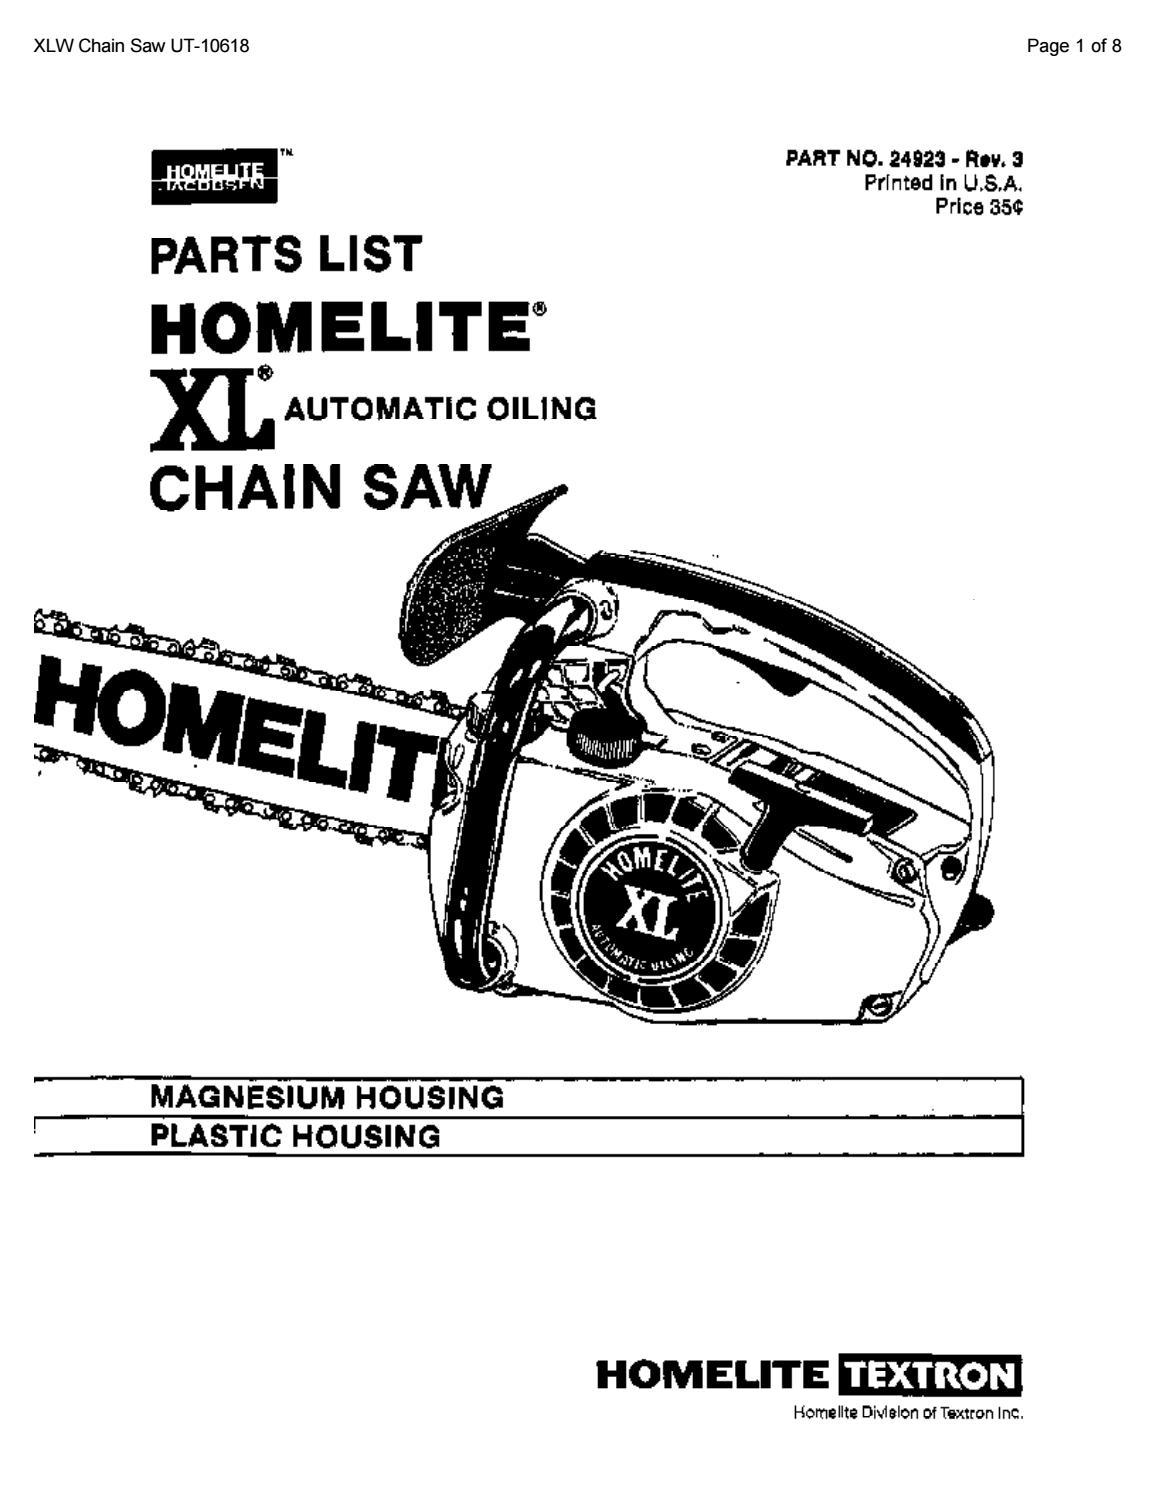 Homelite XL Chainsaw Parts List by glsense - issuuIssuu